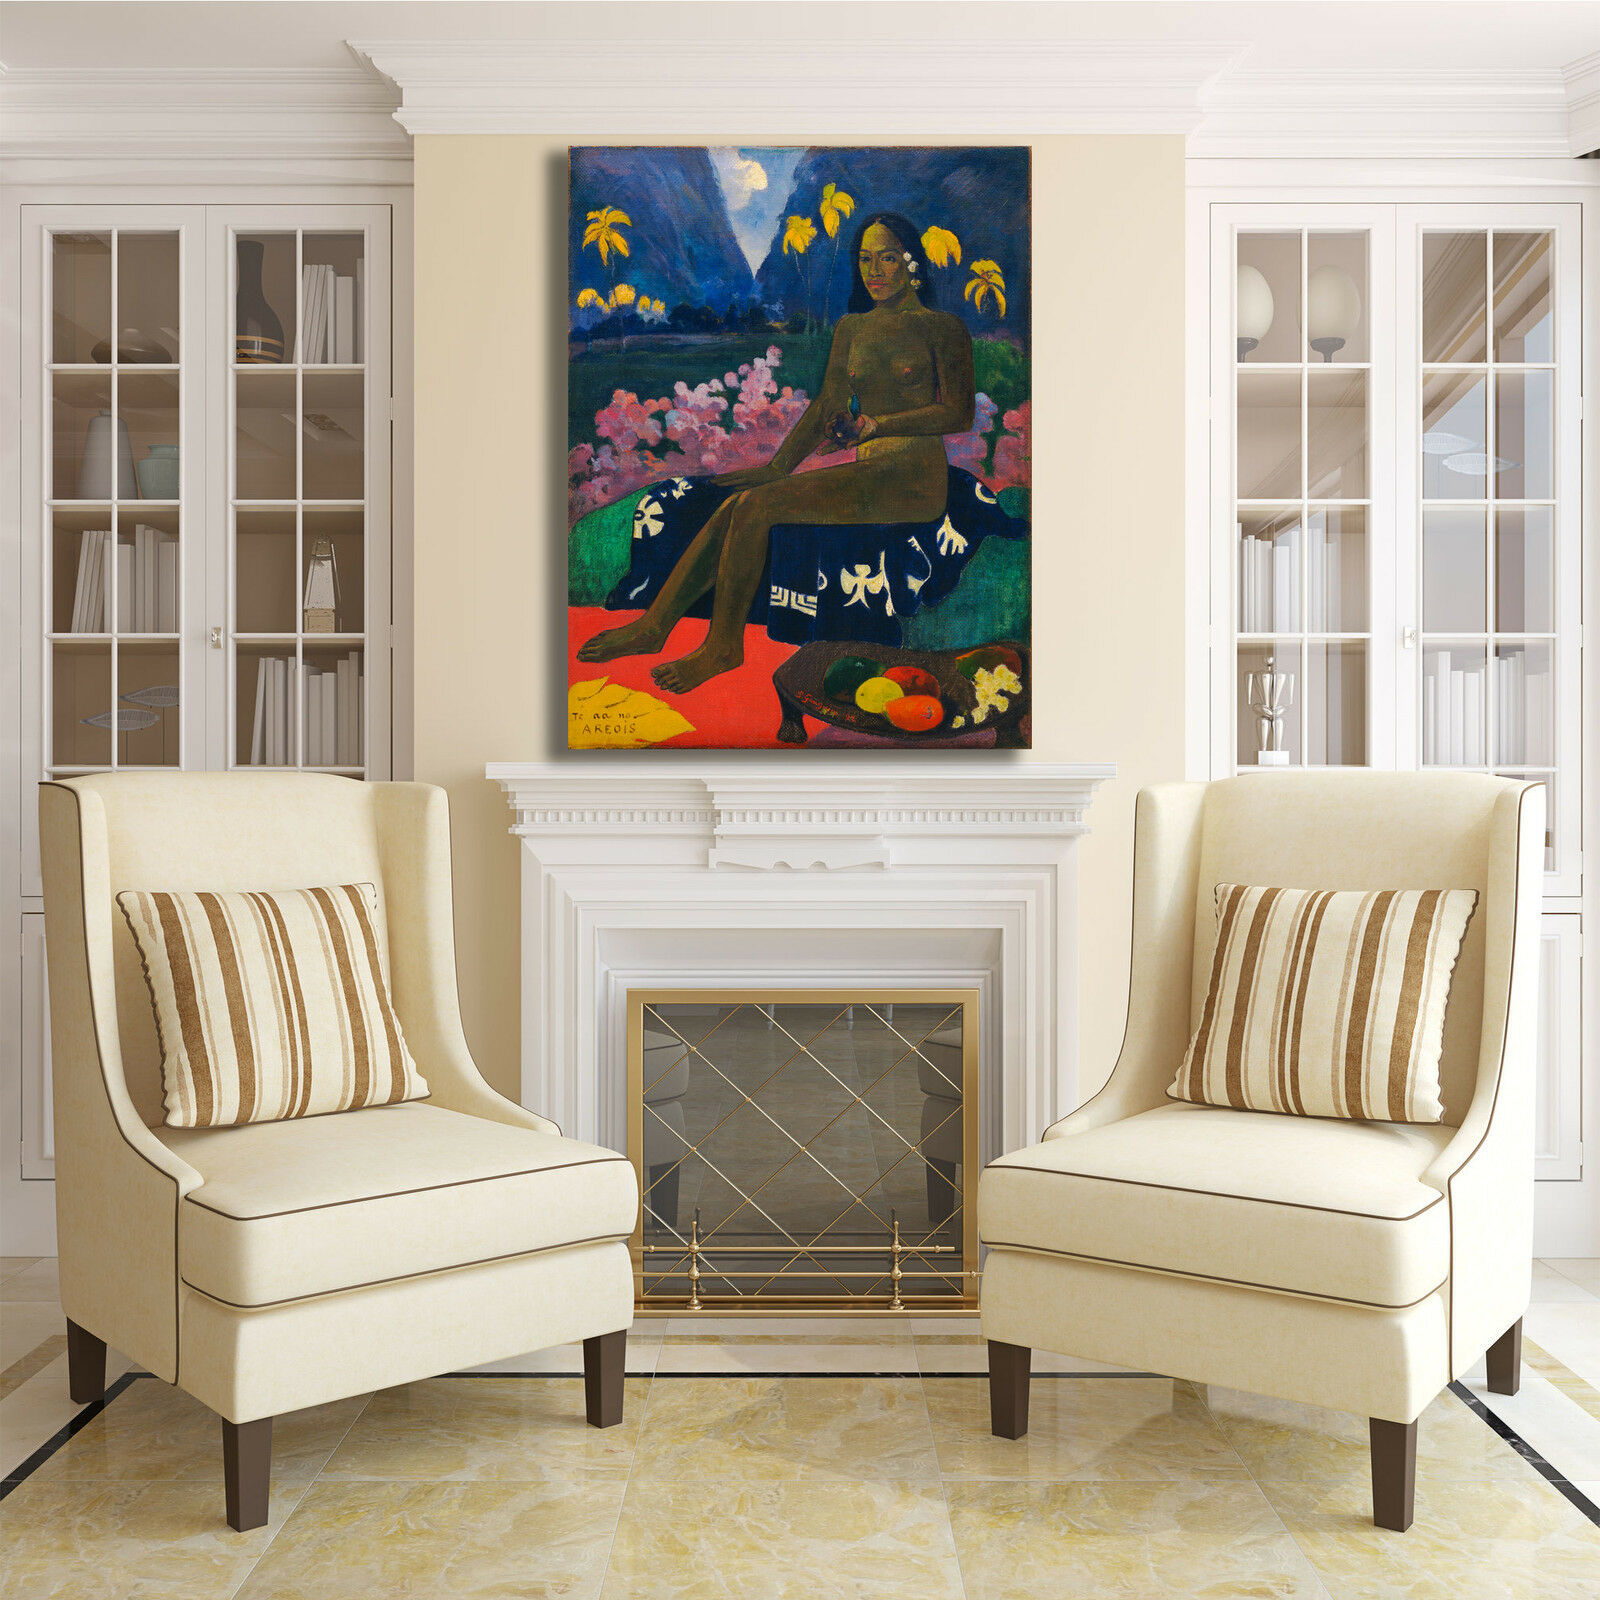 Gauguin seme seme seme di Areoi design quadro stampa tela dipinto telaio arRouge o casa | Soldes  729b90